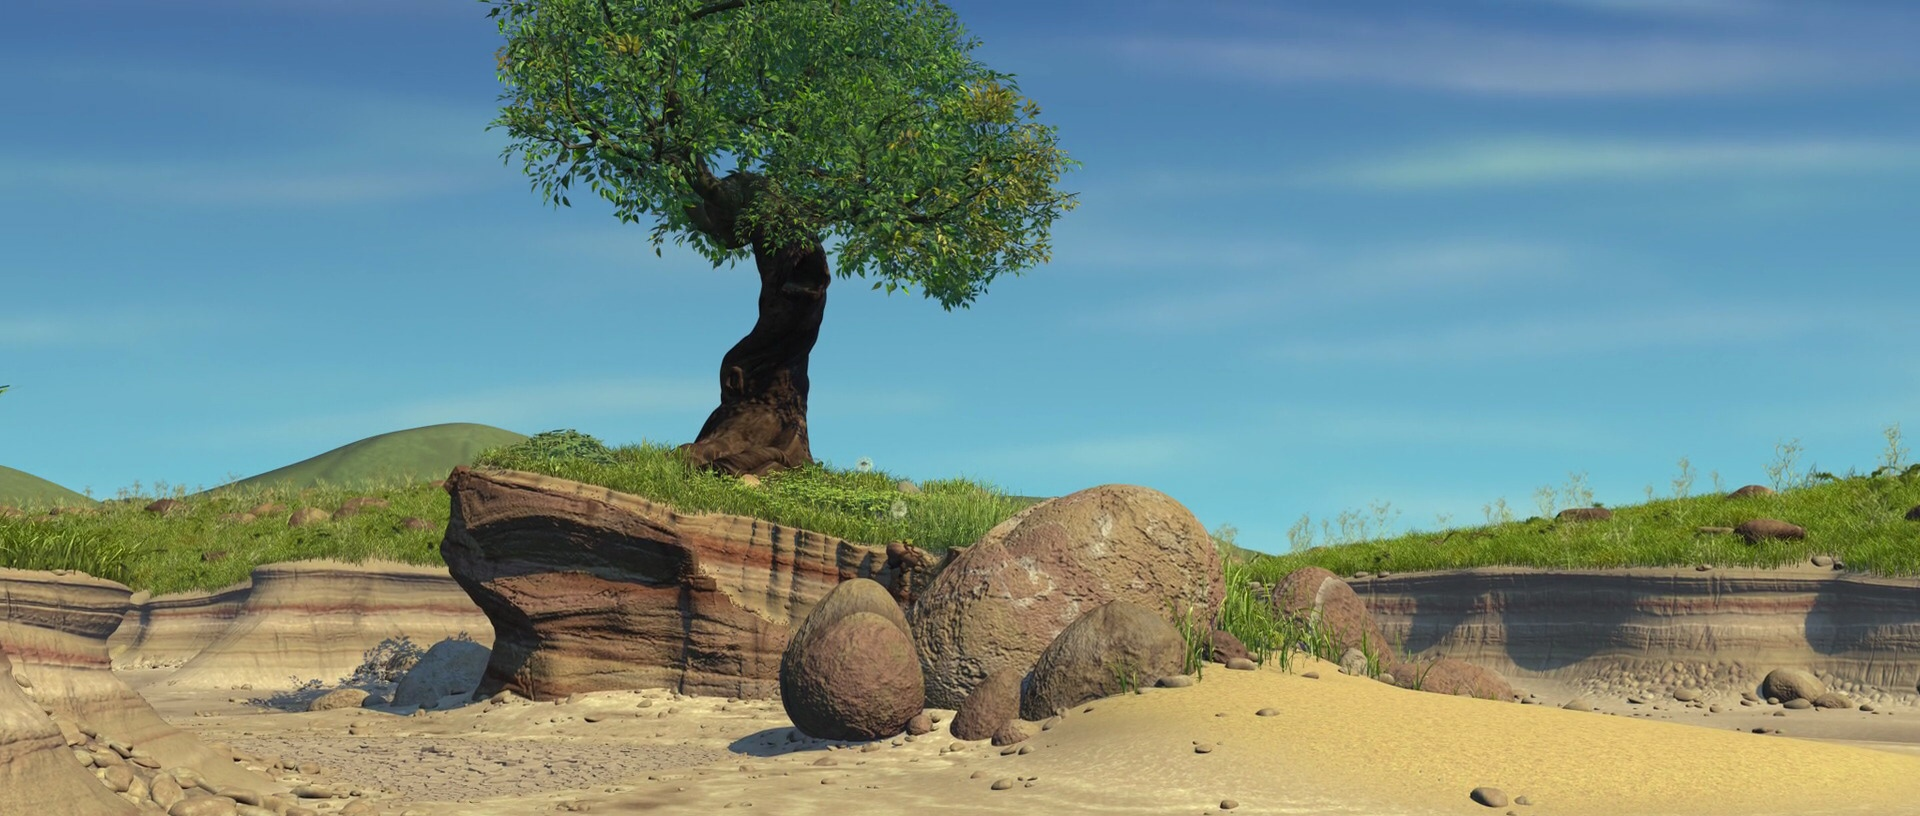 Ilha das Formigas